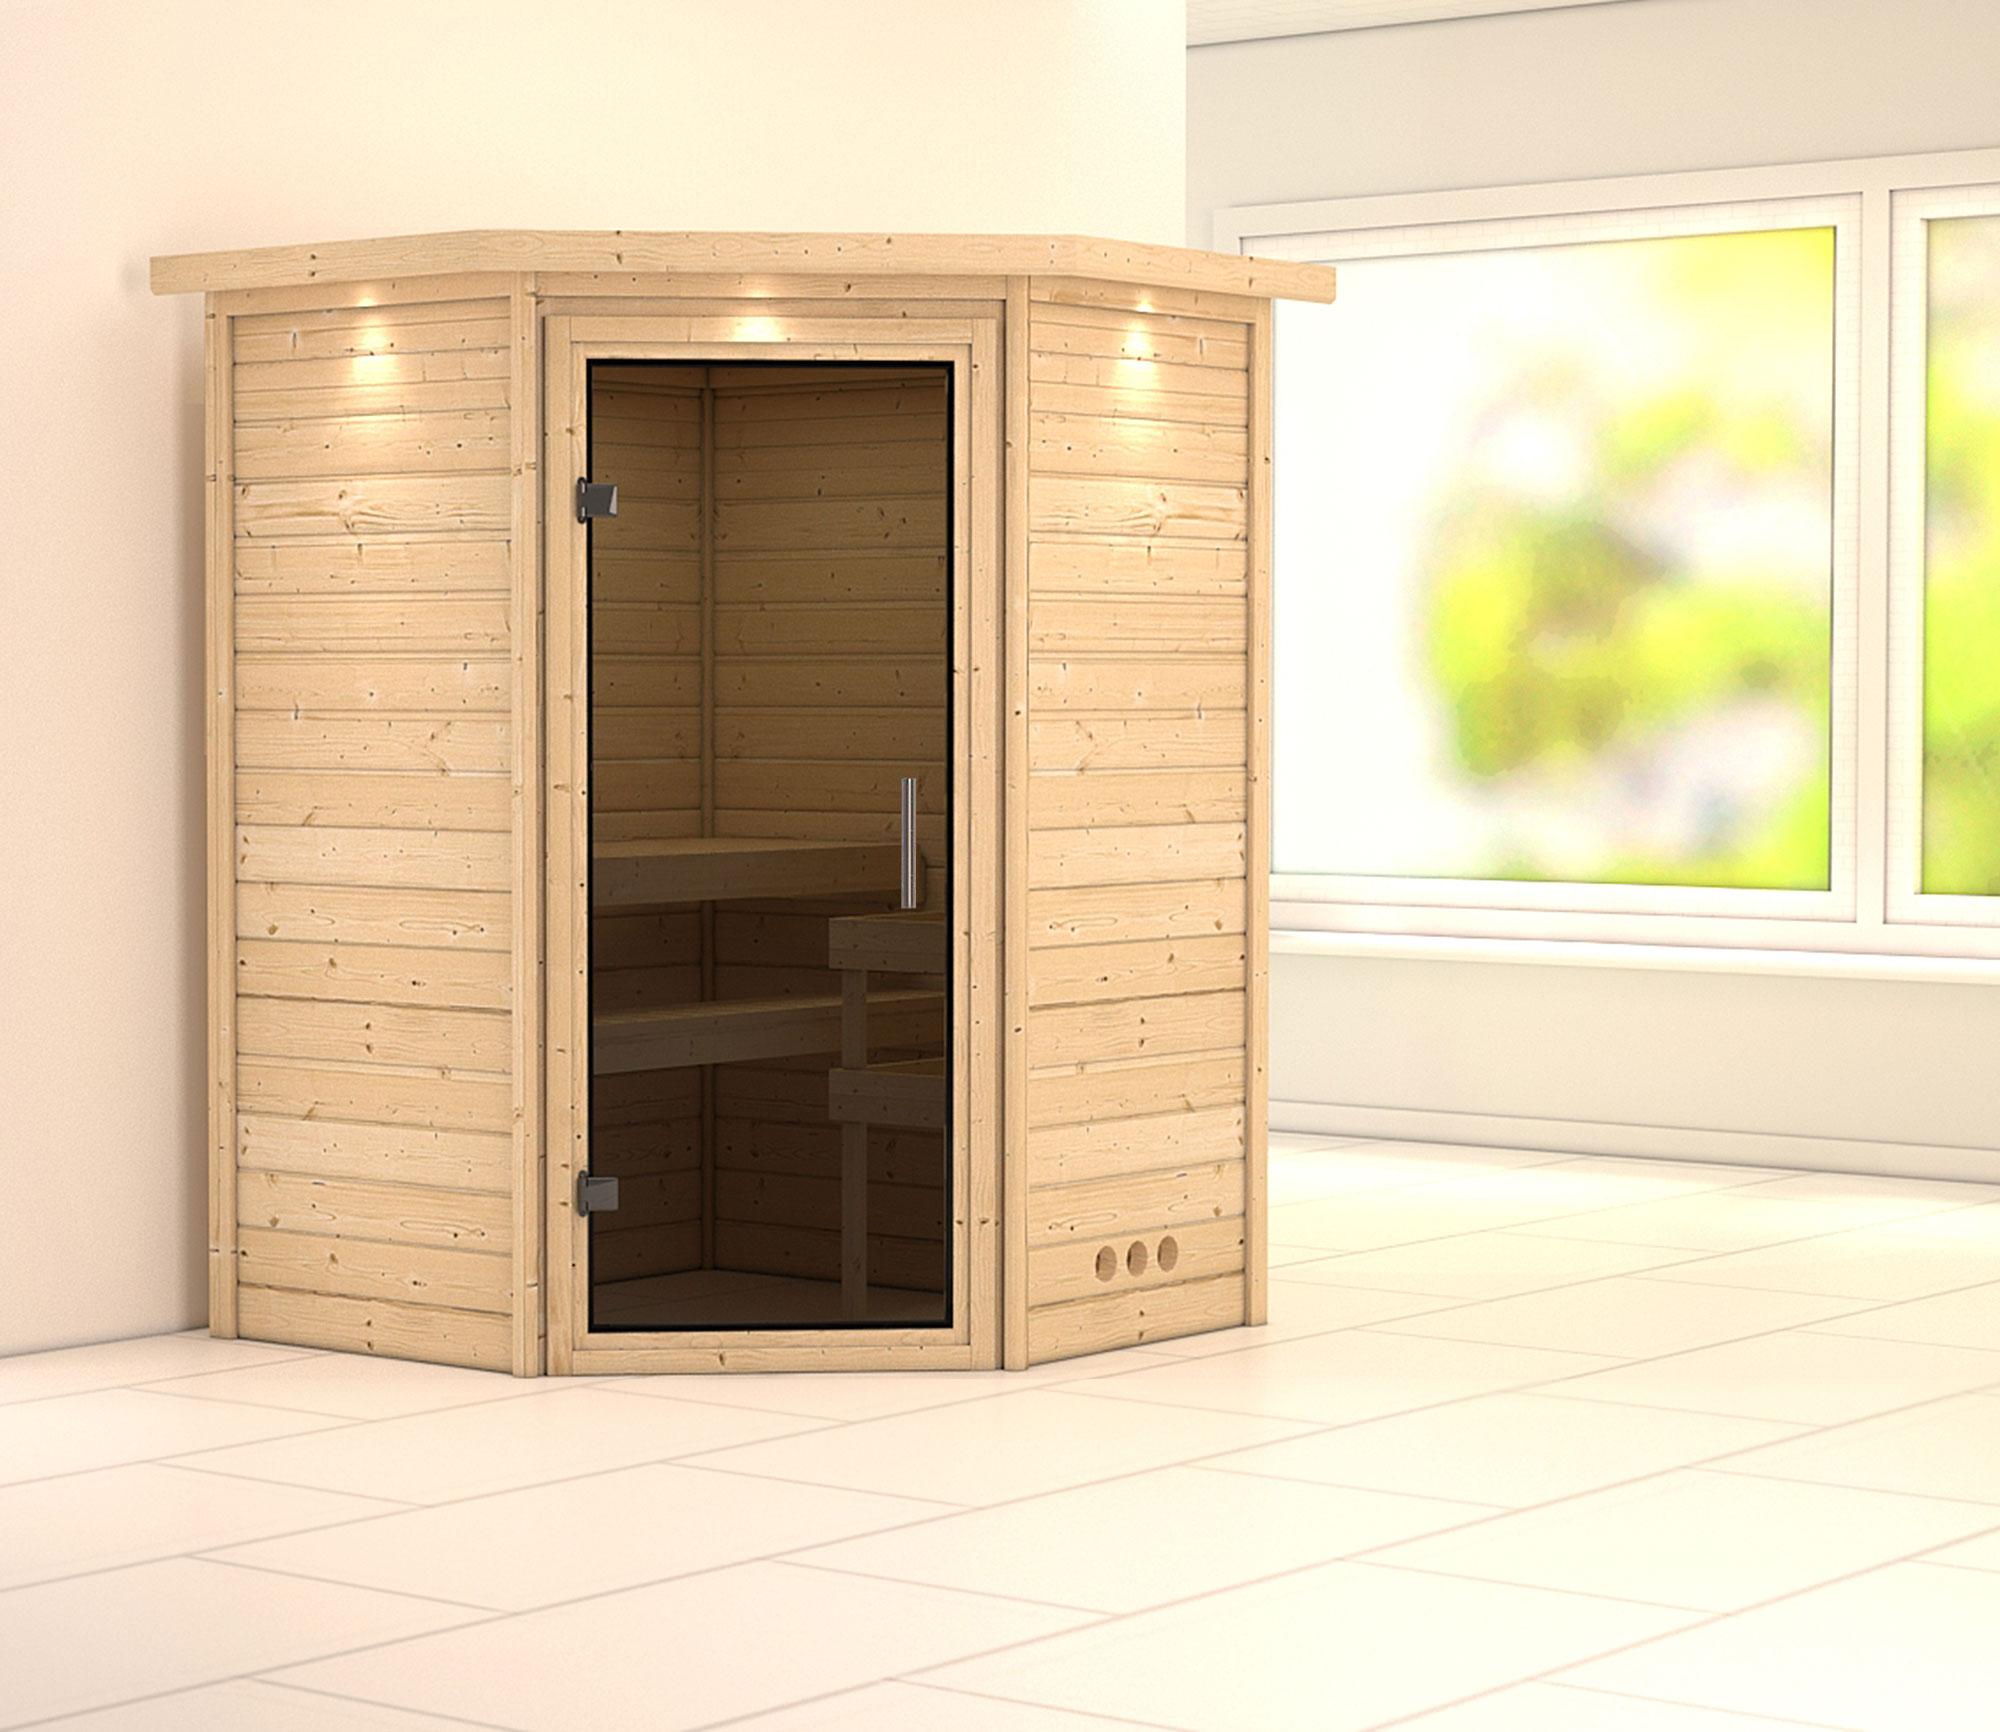 Woodfeeling Sauna Franka 38mm 230V Dachkranz ohne Ofen moderne Tür Bild 1